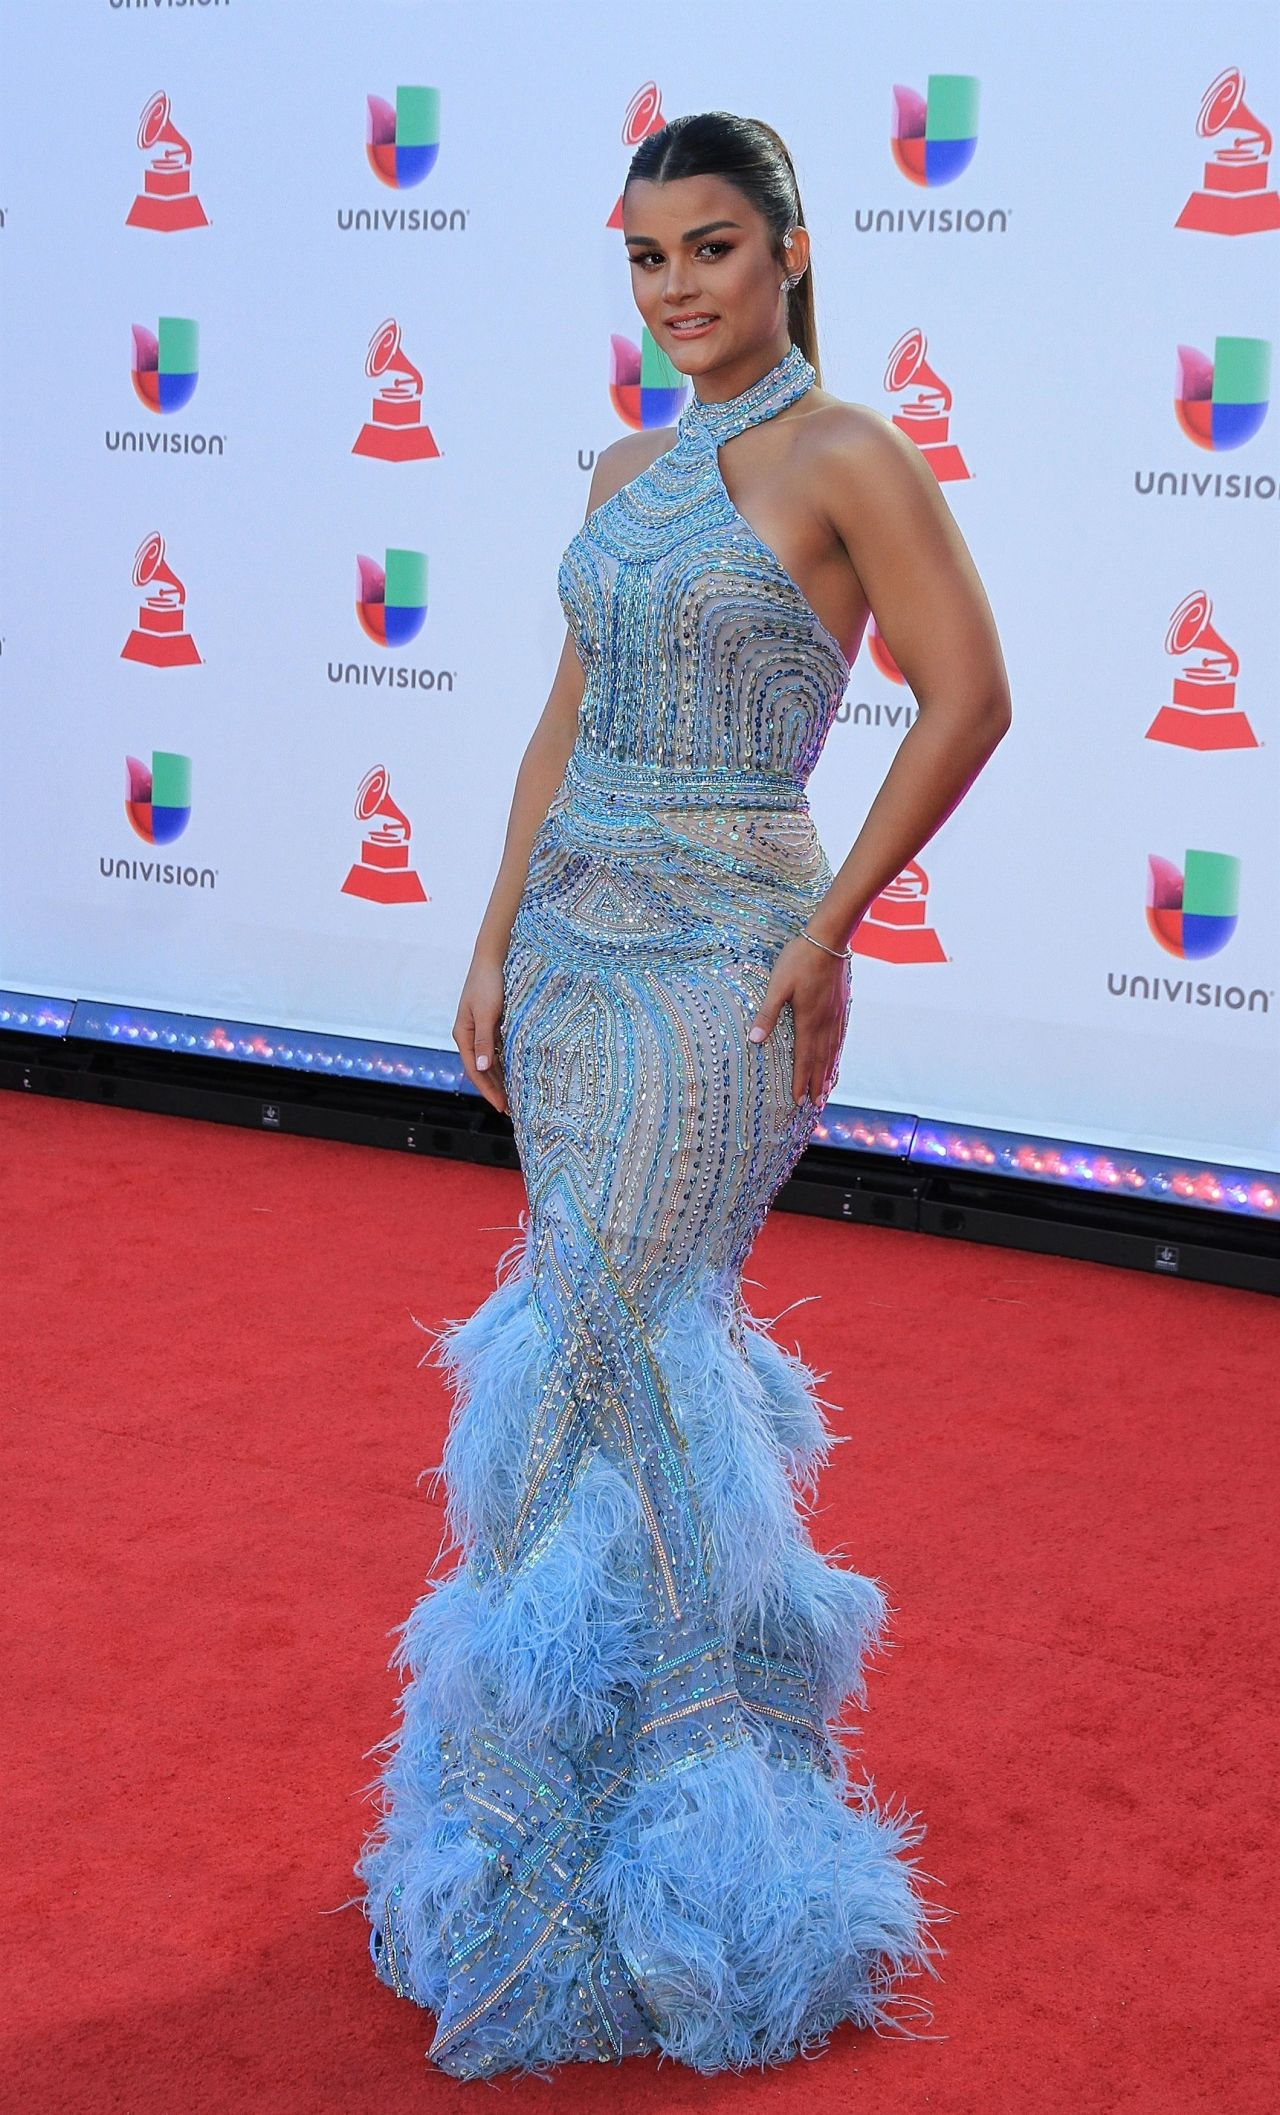 3rd Annual Latin Grammy Awards